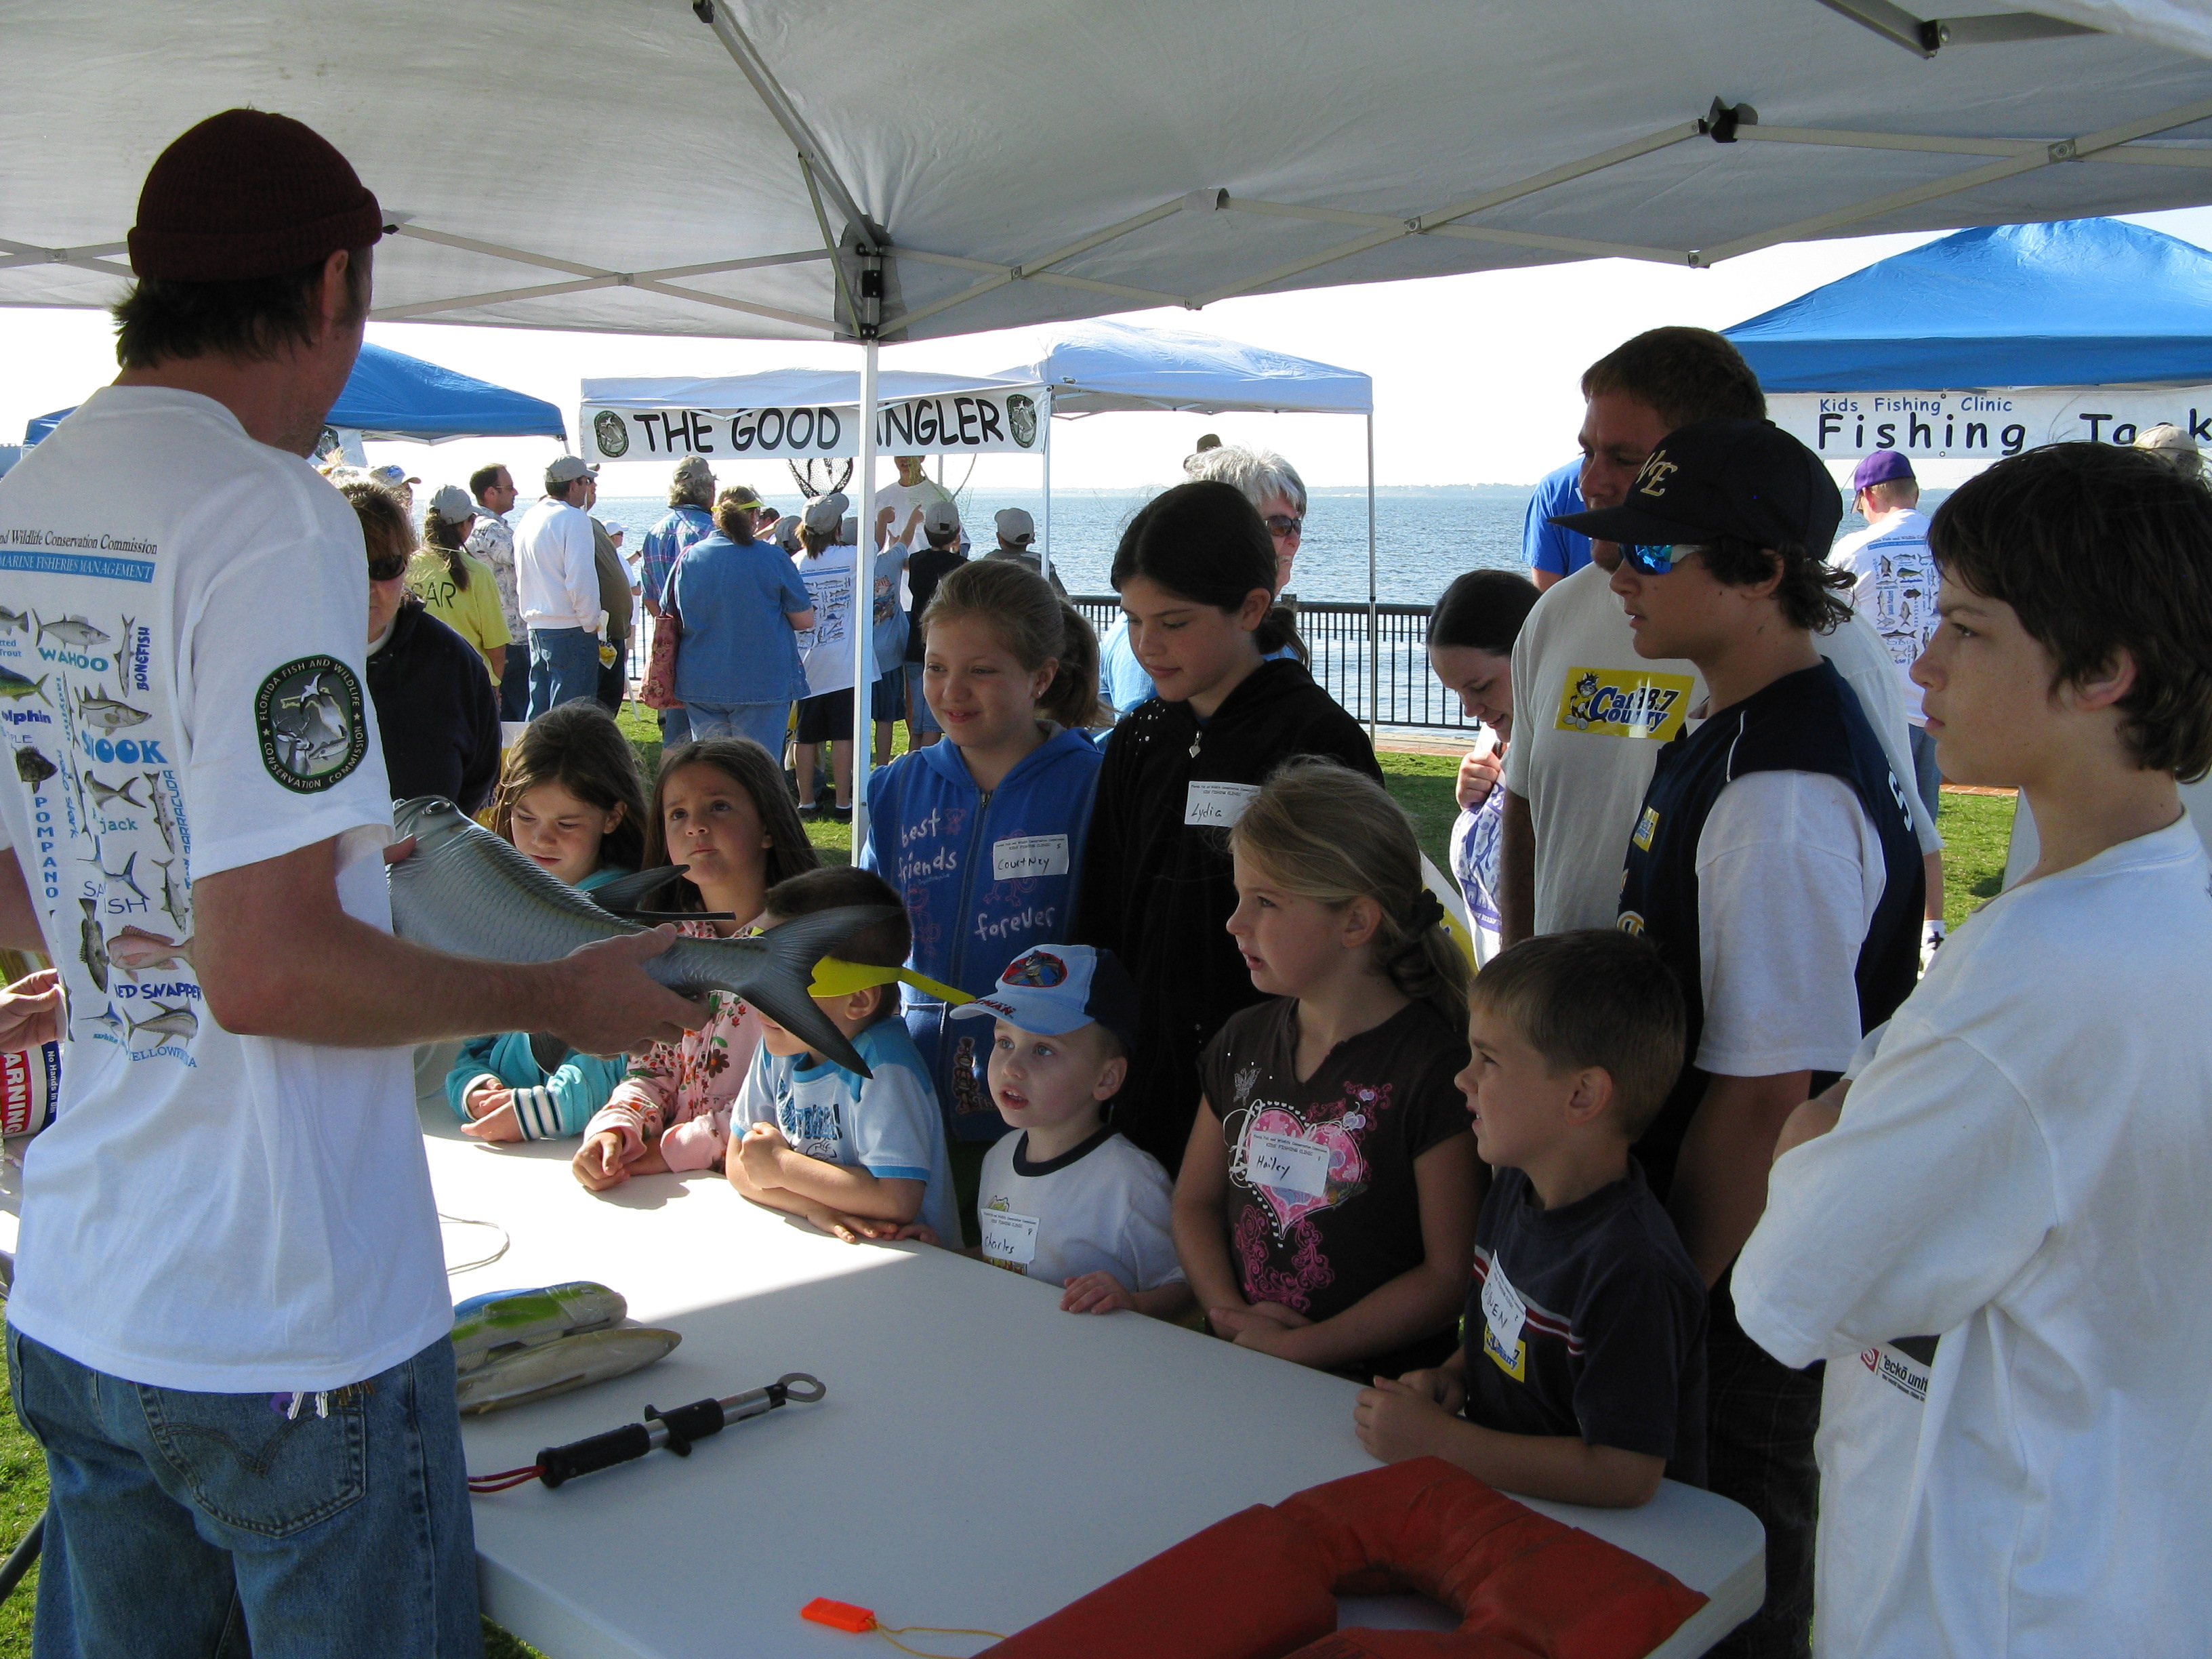 Pensacola Fishing Report 4/5/17